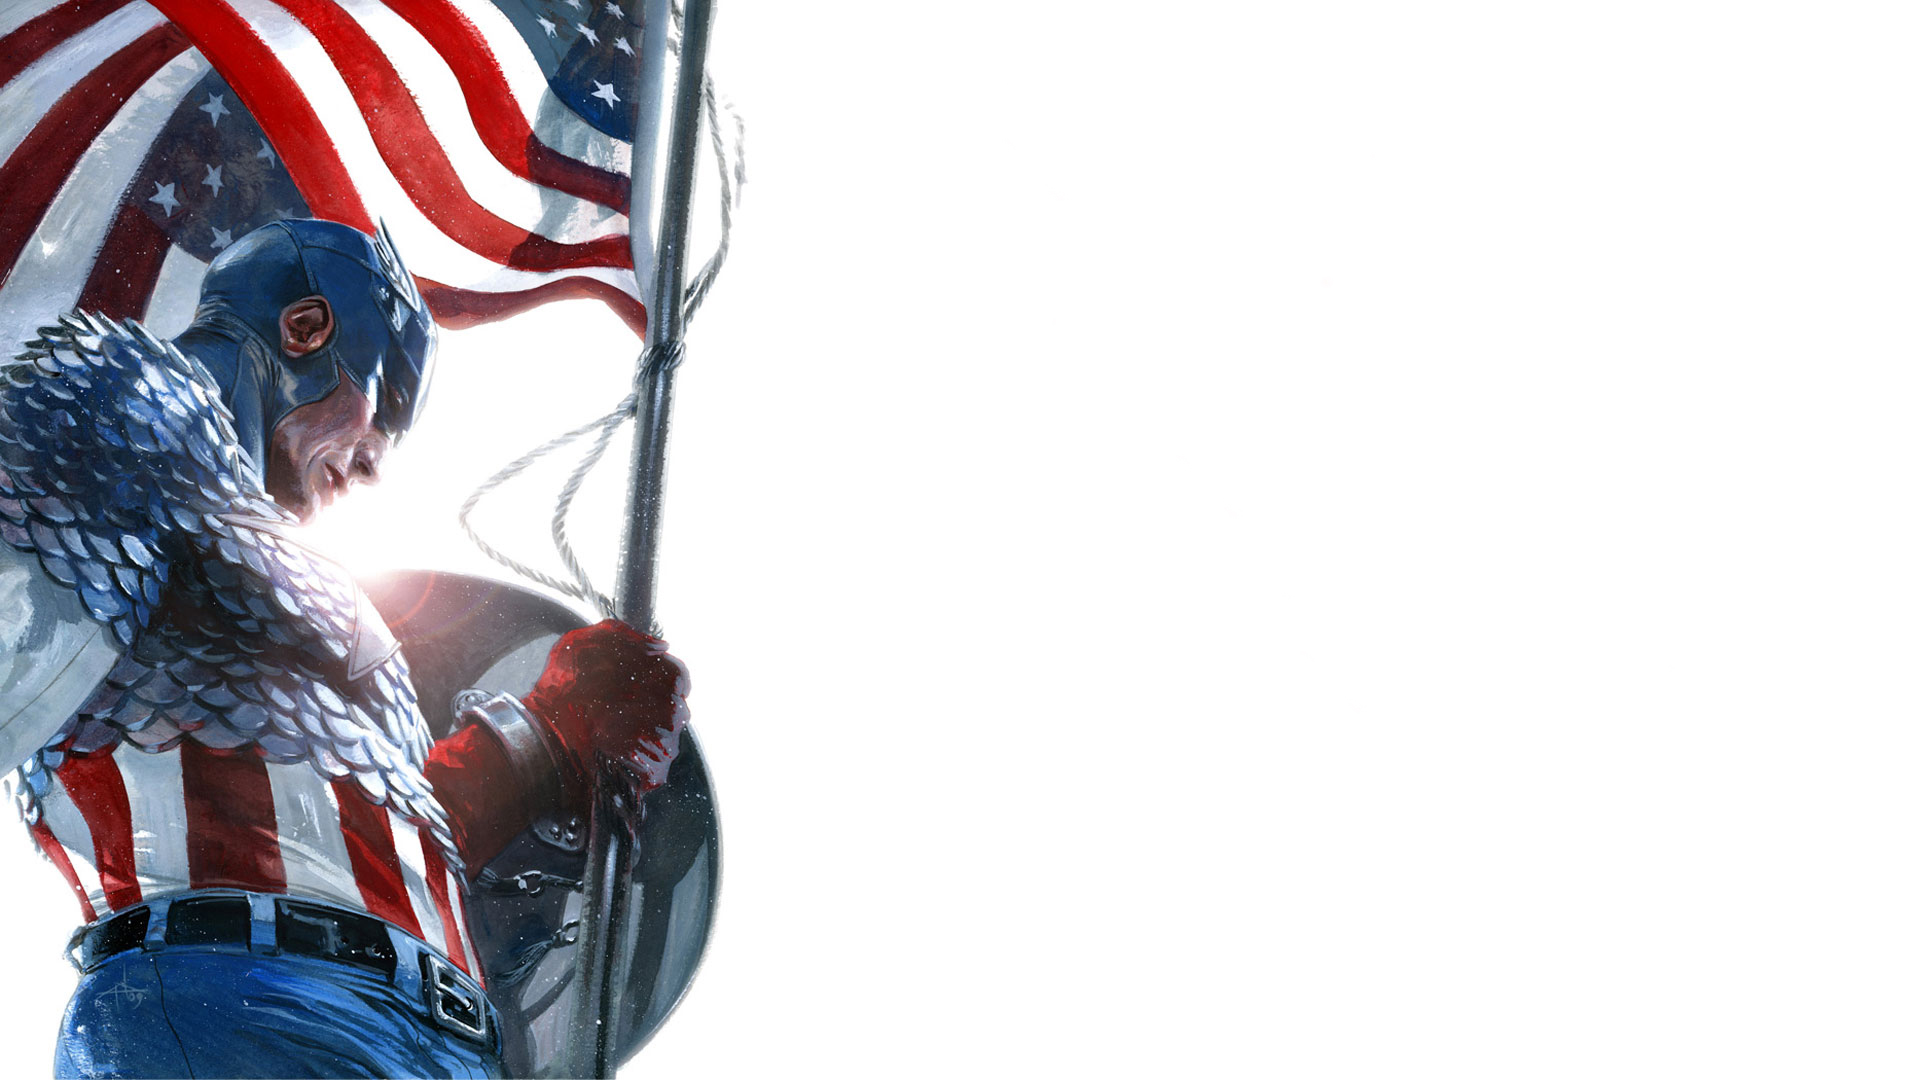 Captain America Wallpaper 1920x1080 Captain America 1920x1080